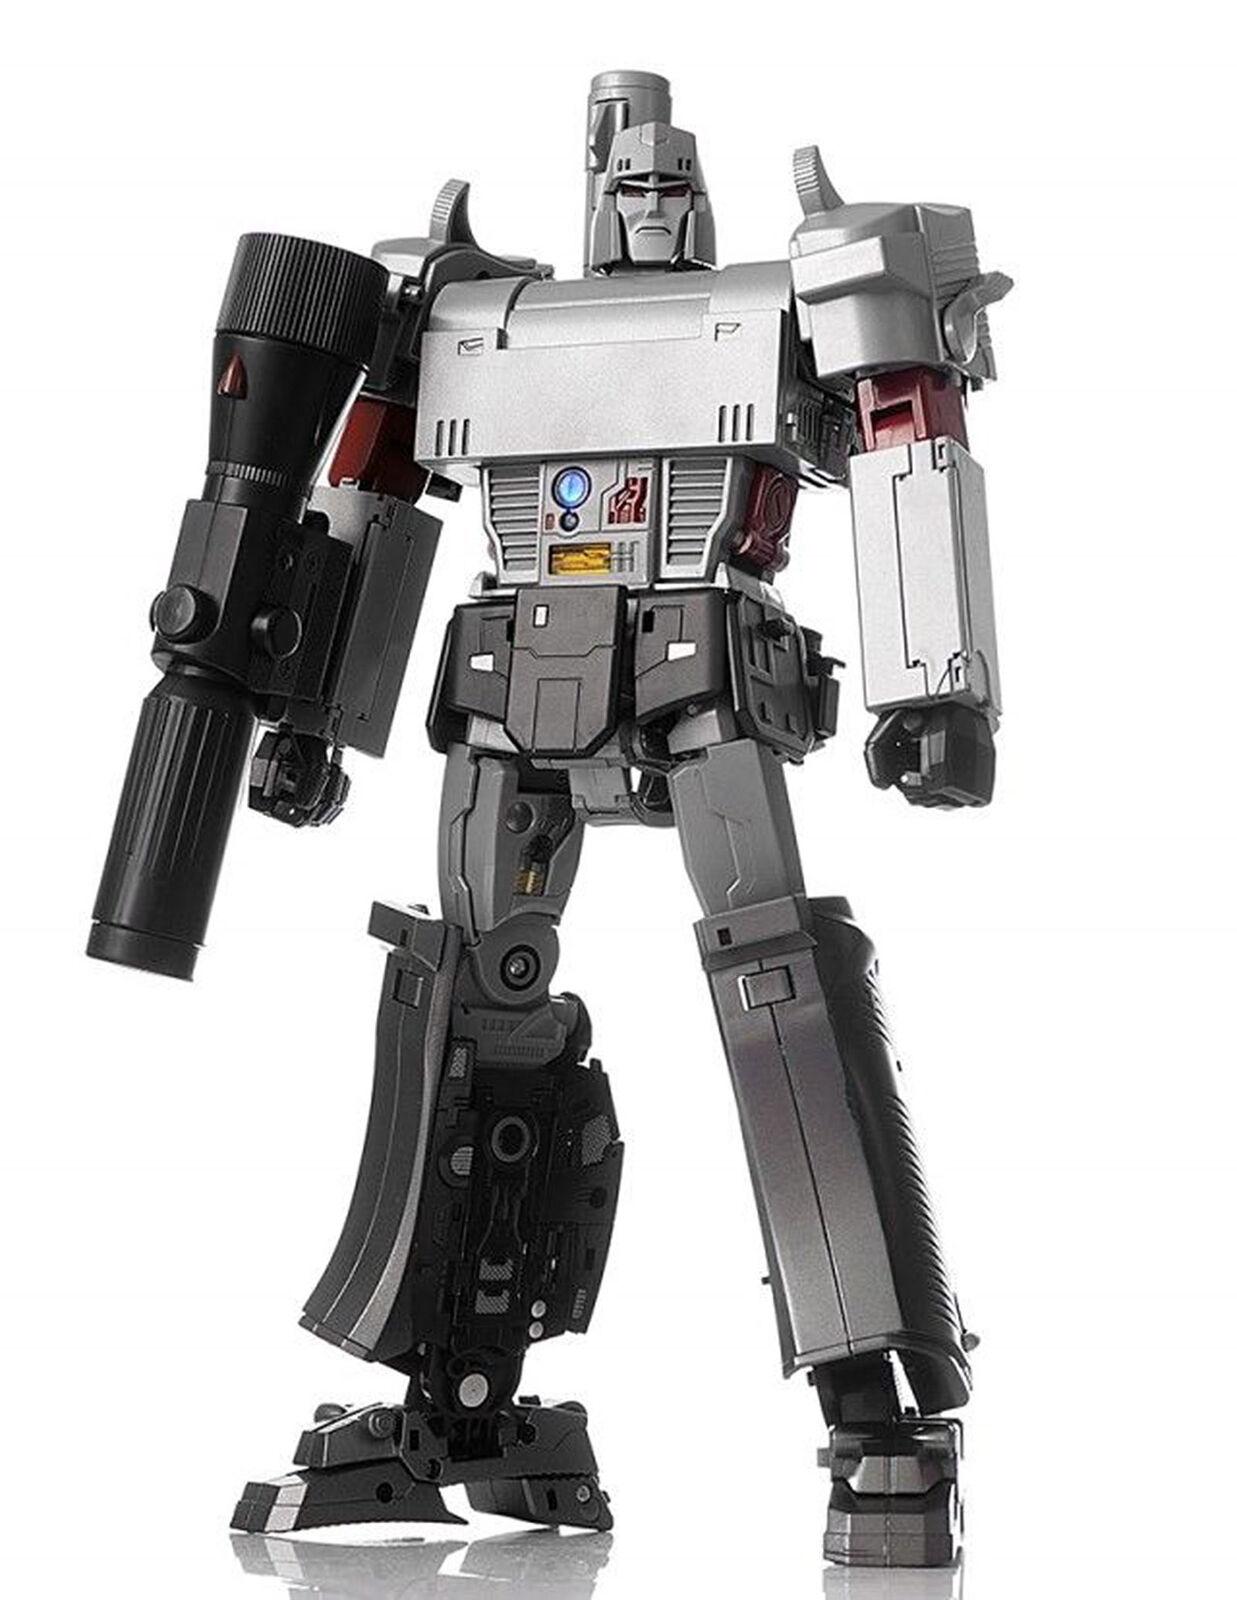 Transformers WEIJIANG NE-01 Megamaster Robot Force Gift Kids Masterpiece Toys